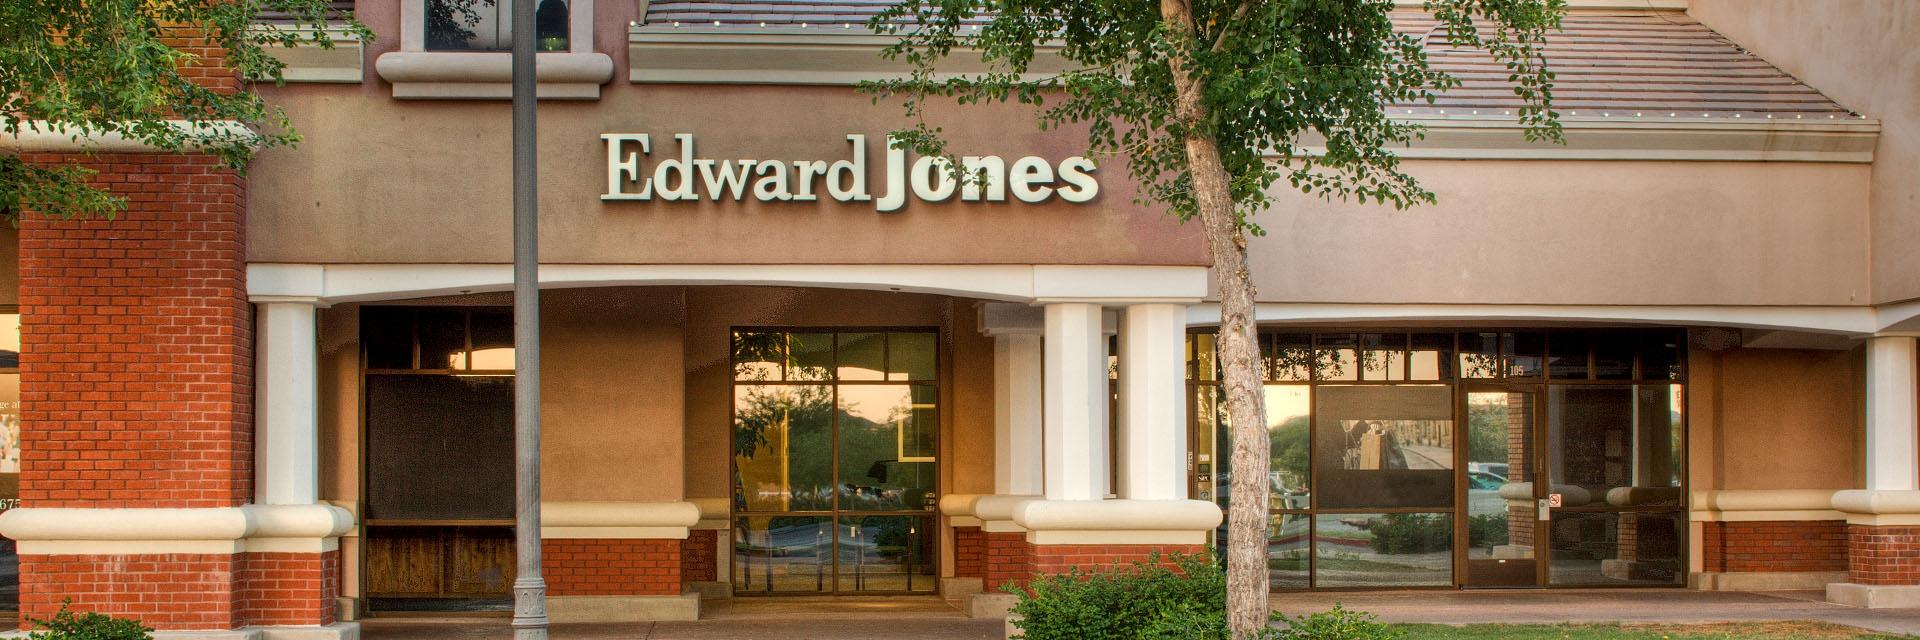 Edward Jones Branch.jpg